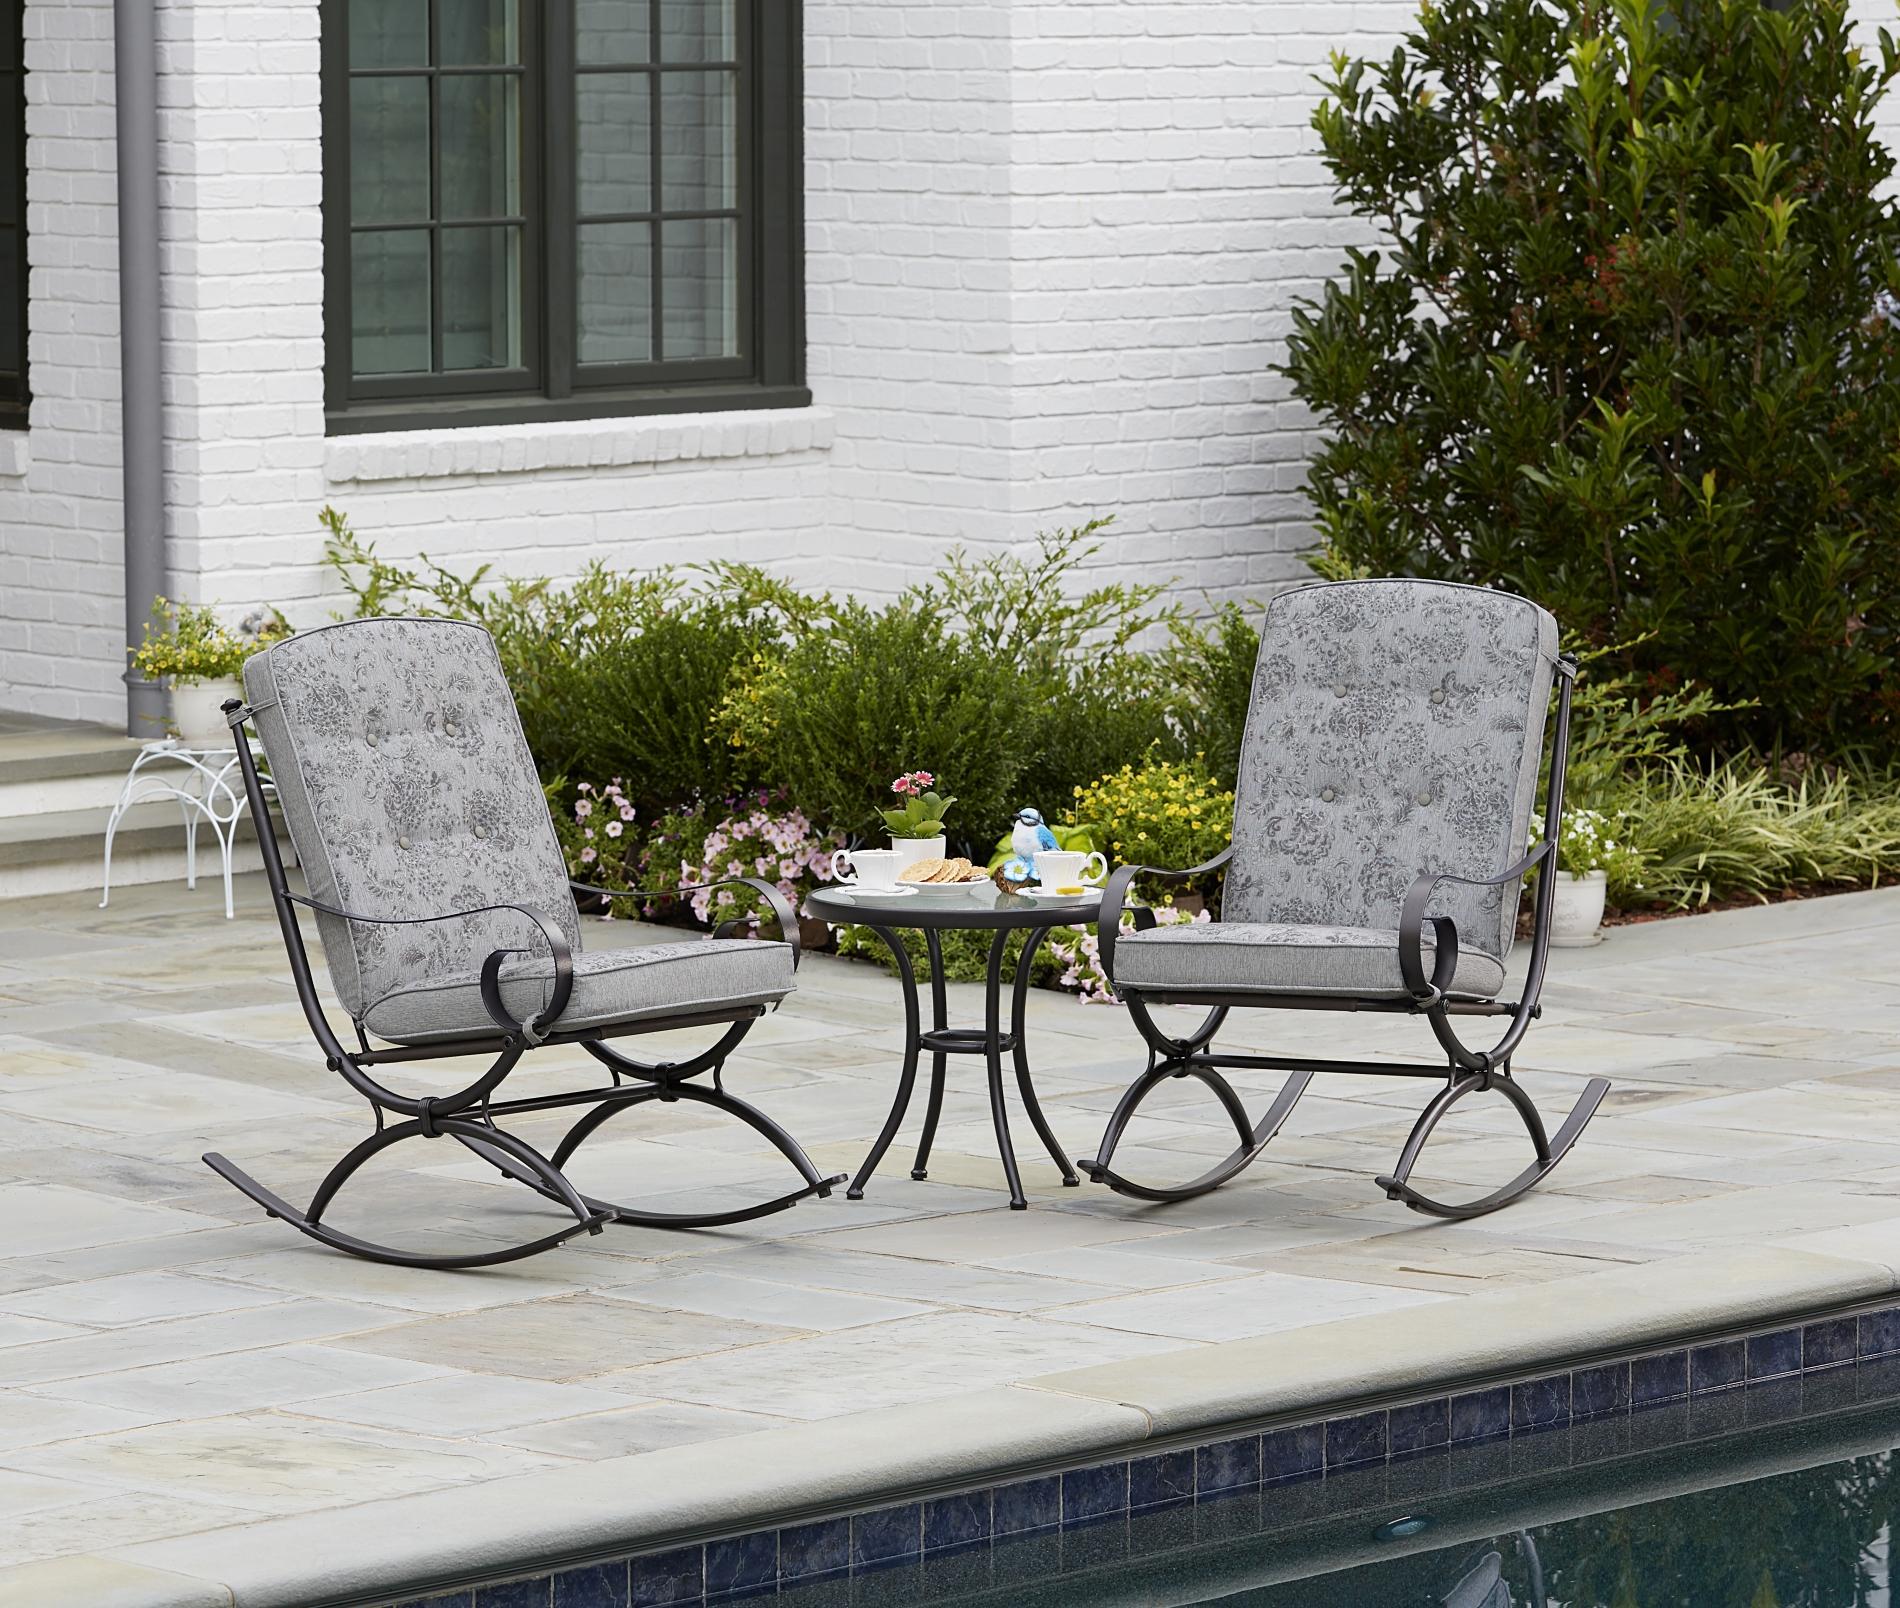 Bistro Sets jaclyn smith centralia 3-piece rocking patio bistro set - gray reversible  cushion FQZJWLD